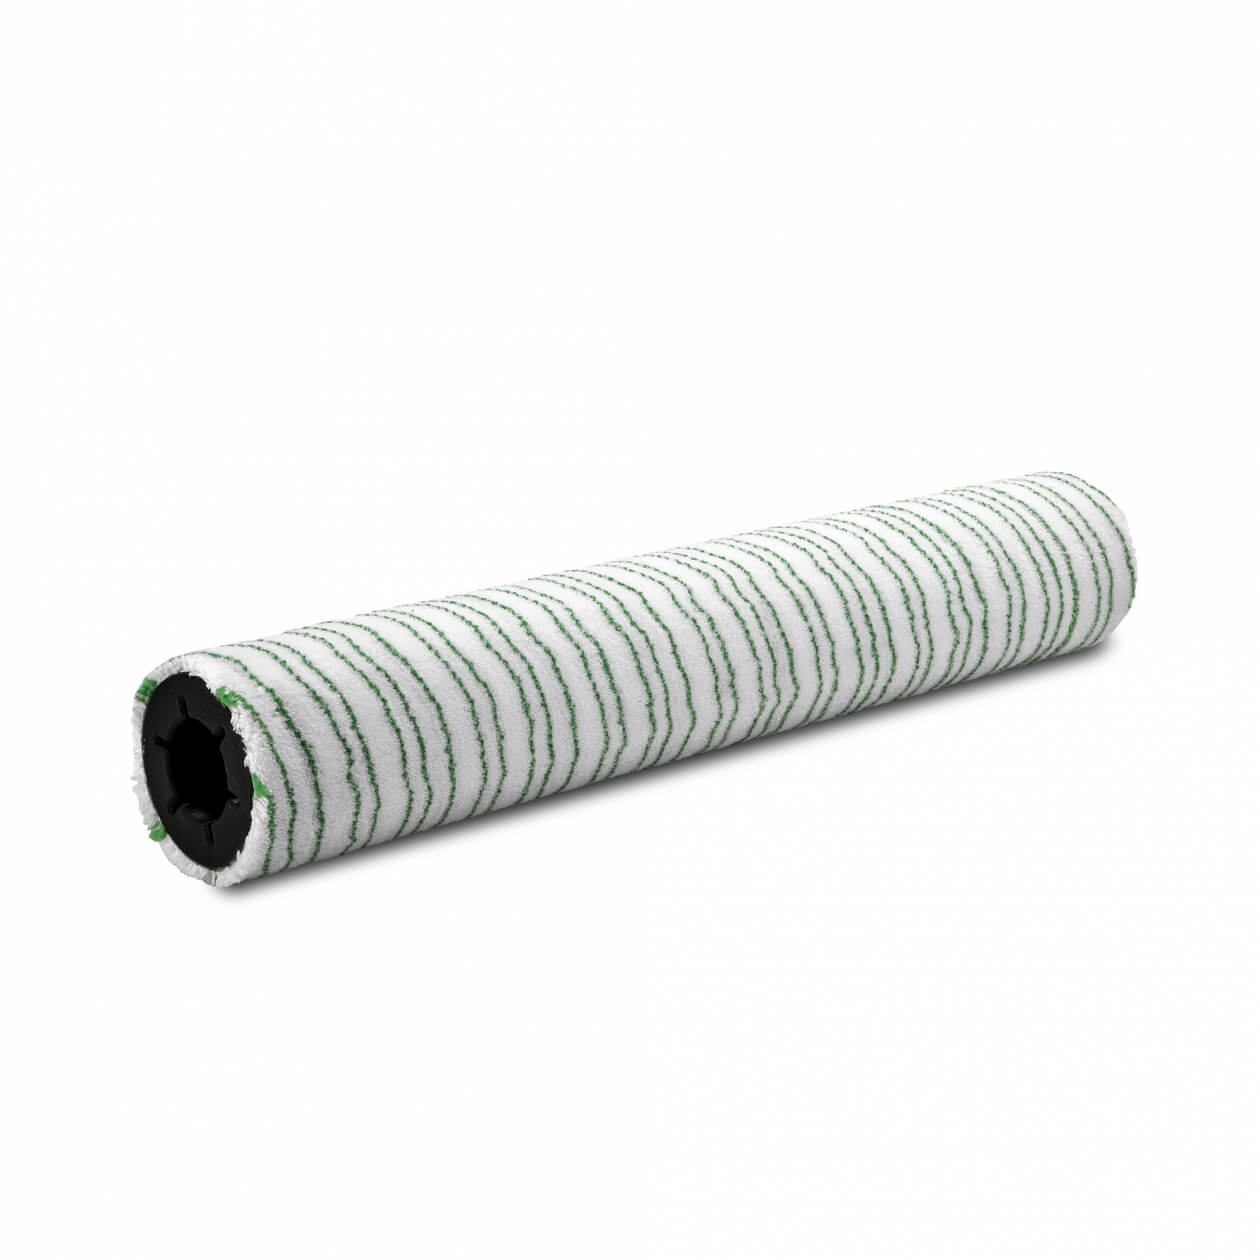 Kärcher, Microfiberrulle 700 mm